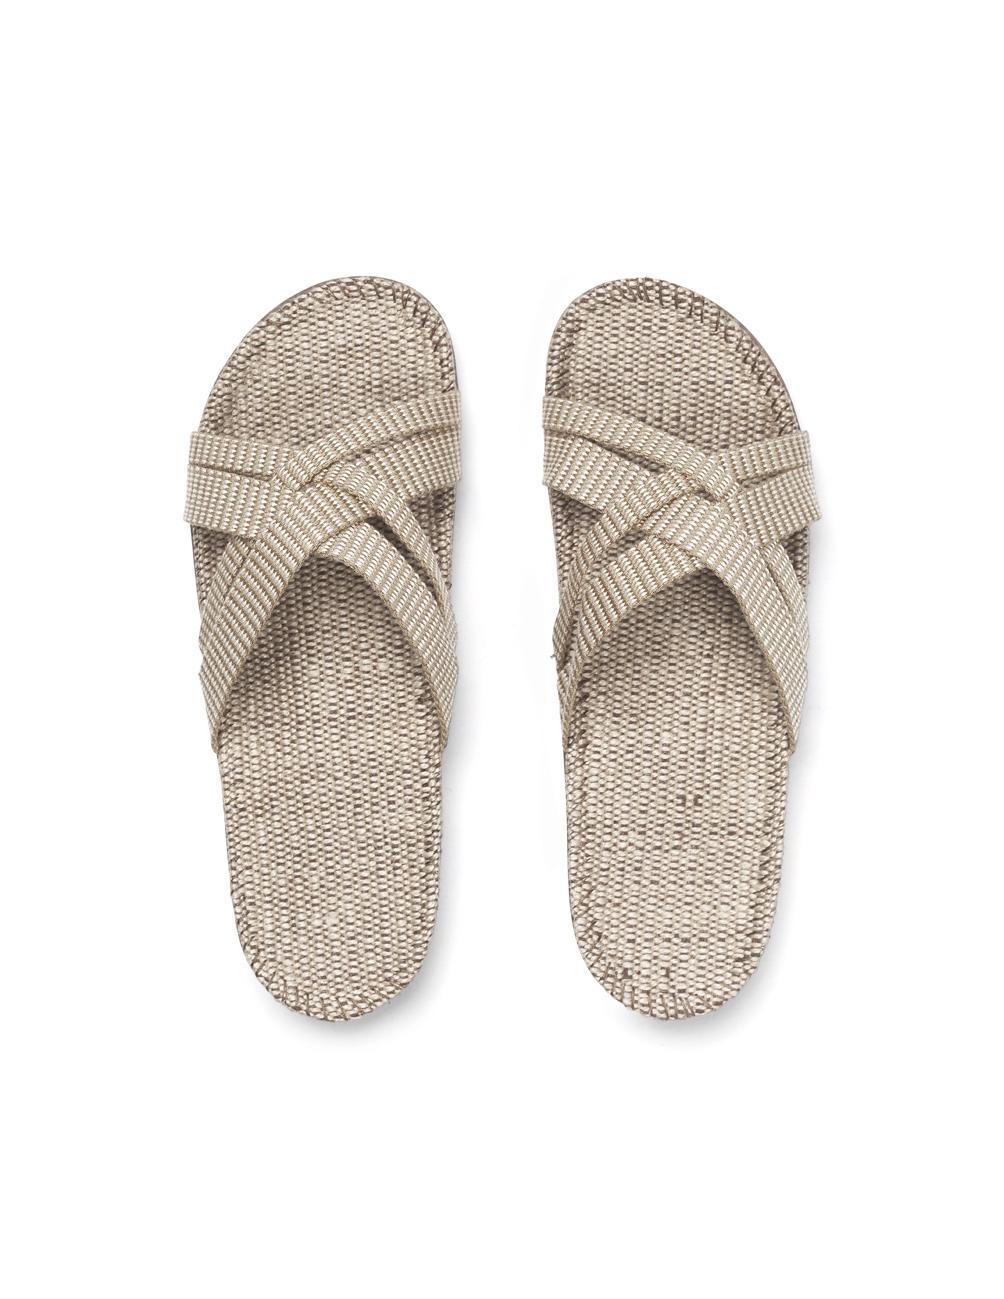 Sandals Creamy White